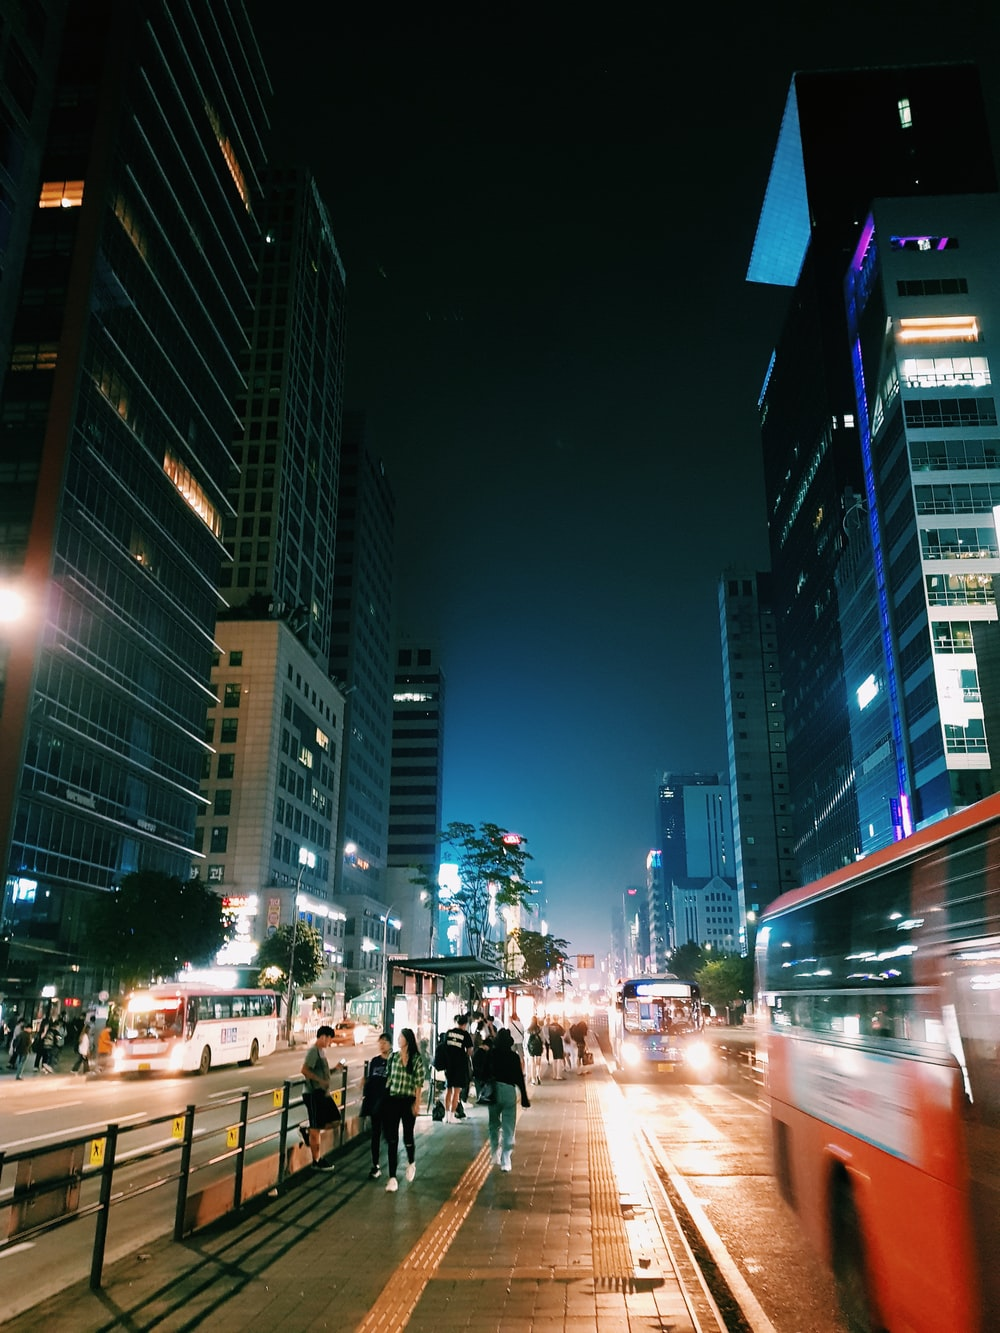 people walking on sidewalk during nighttime